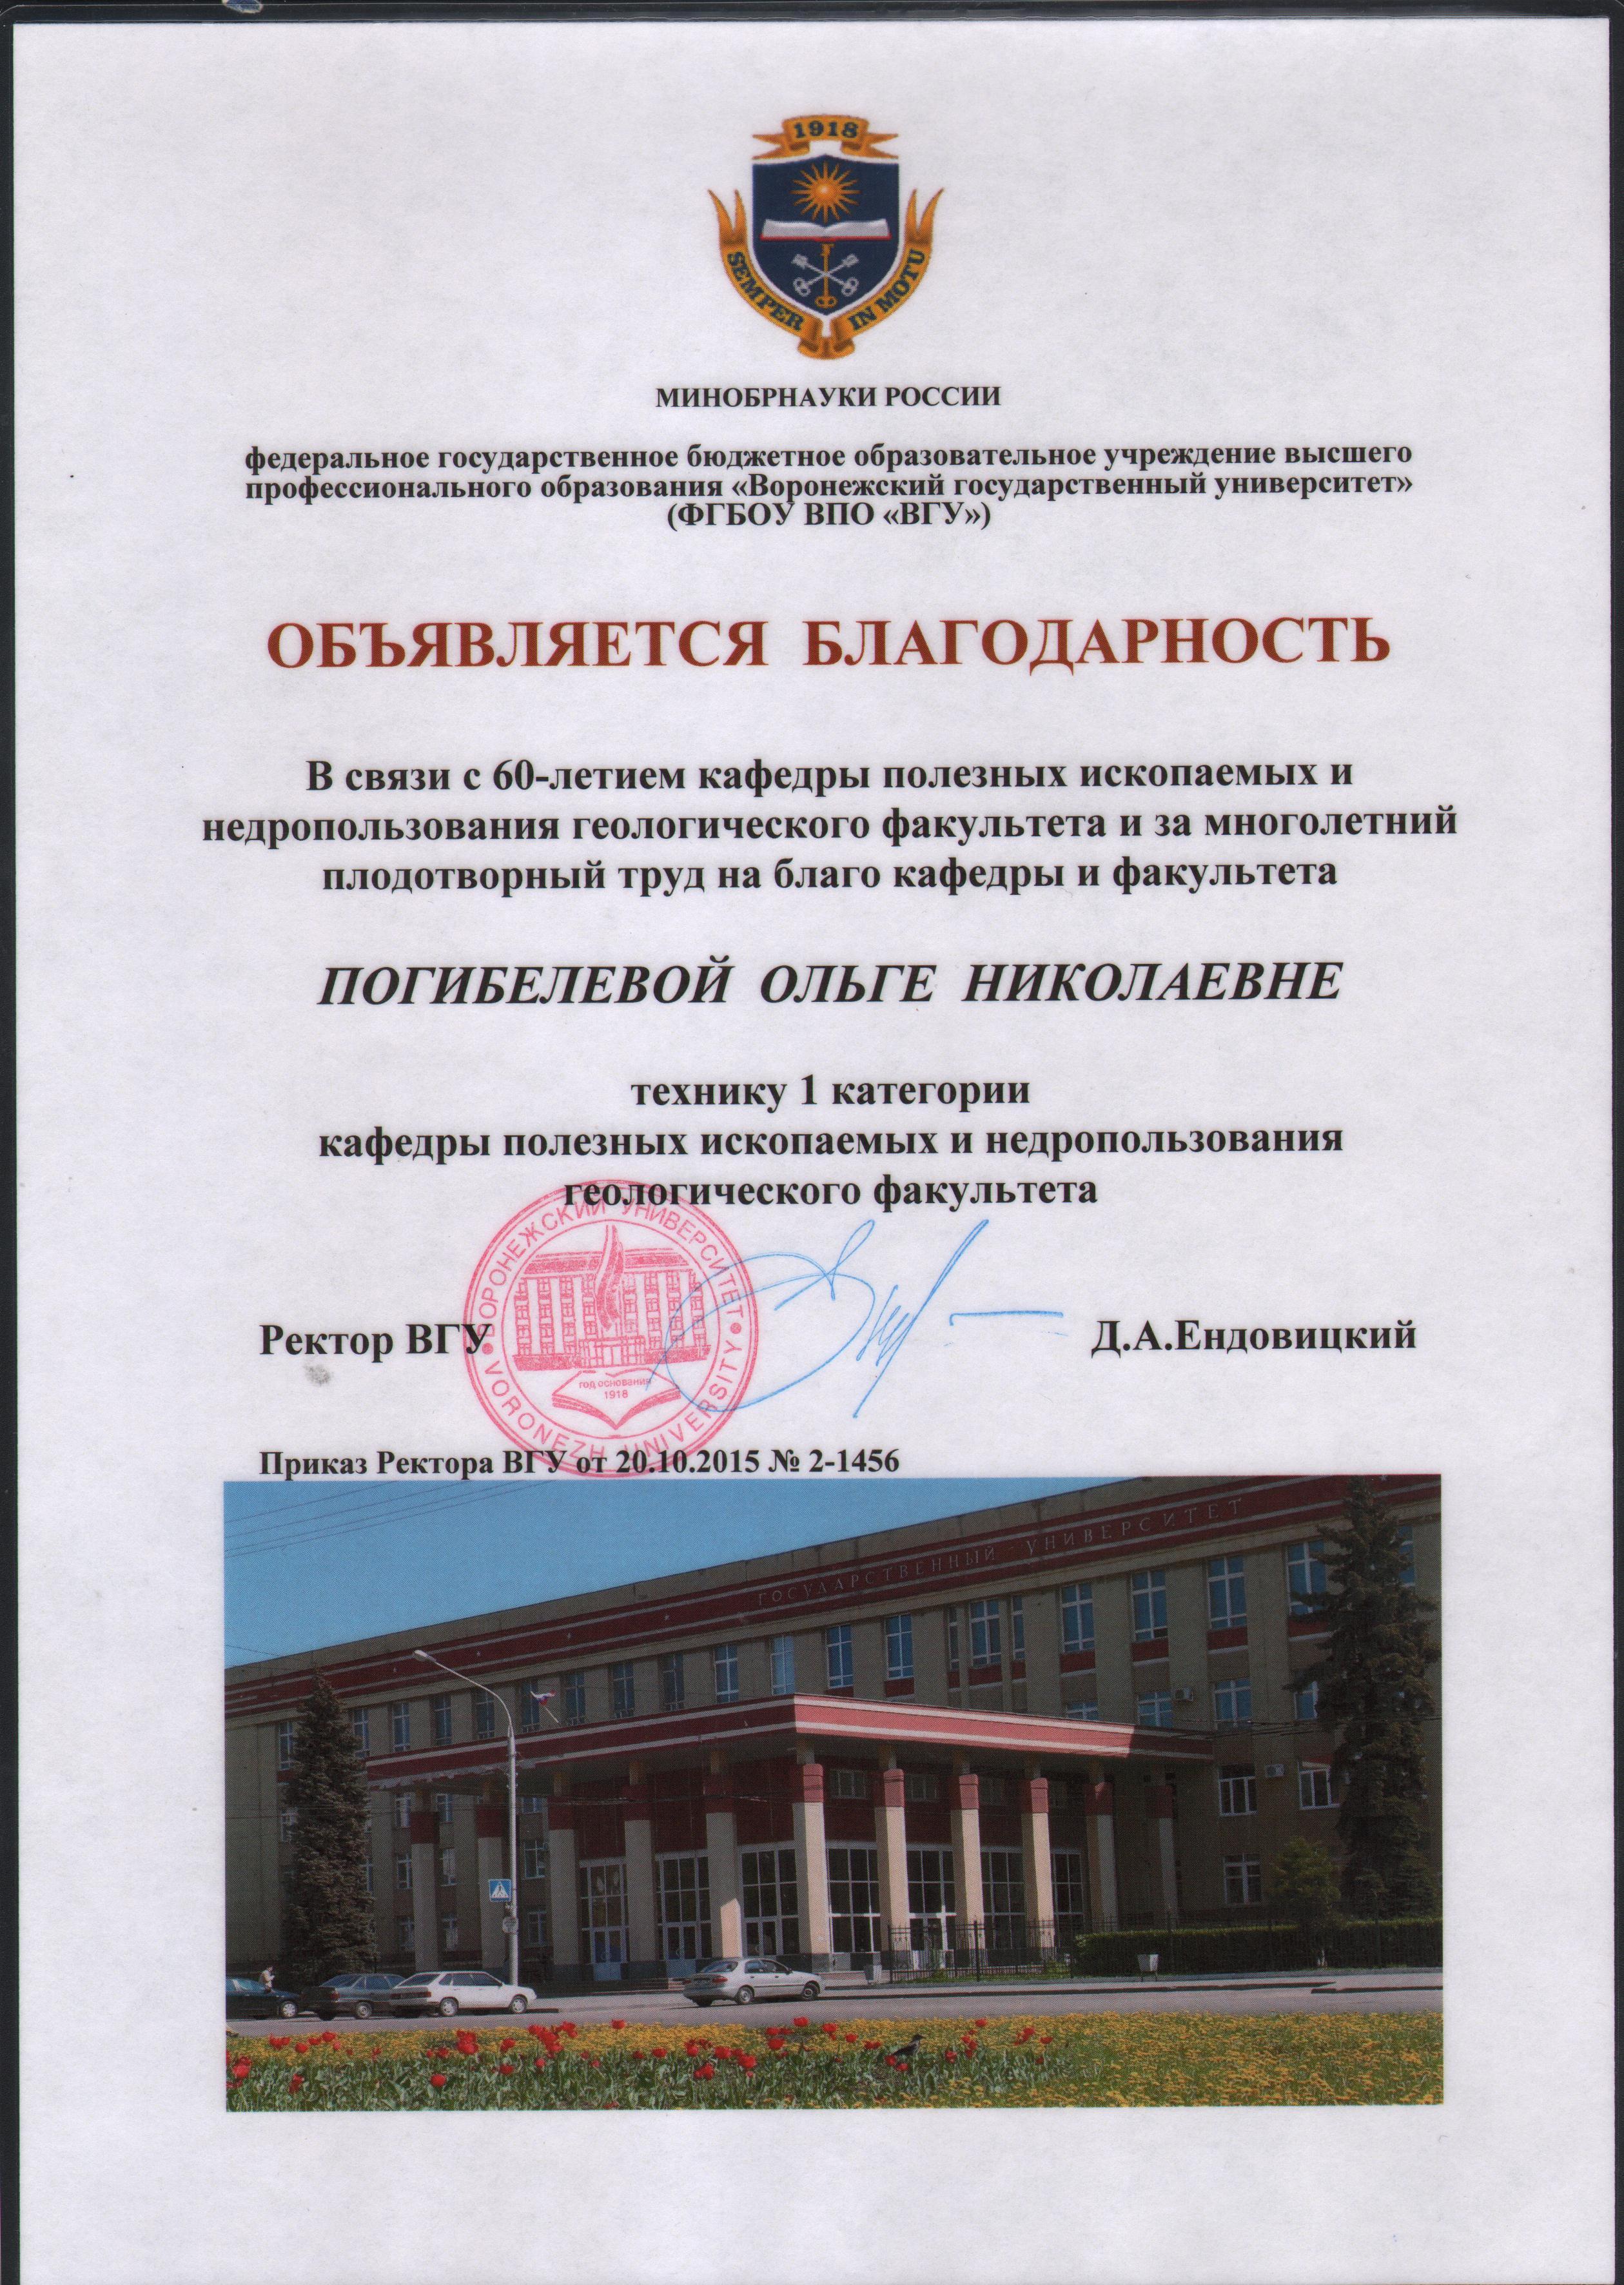 Pogibeleva 001